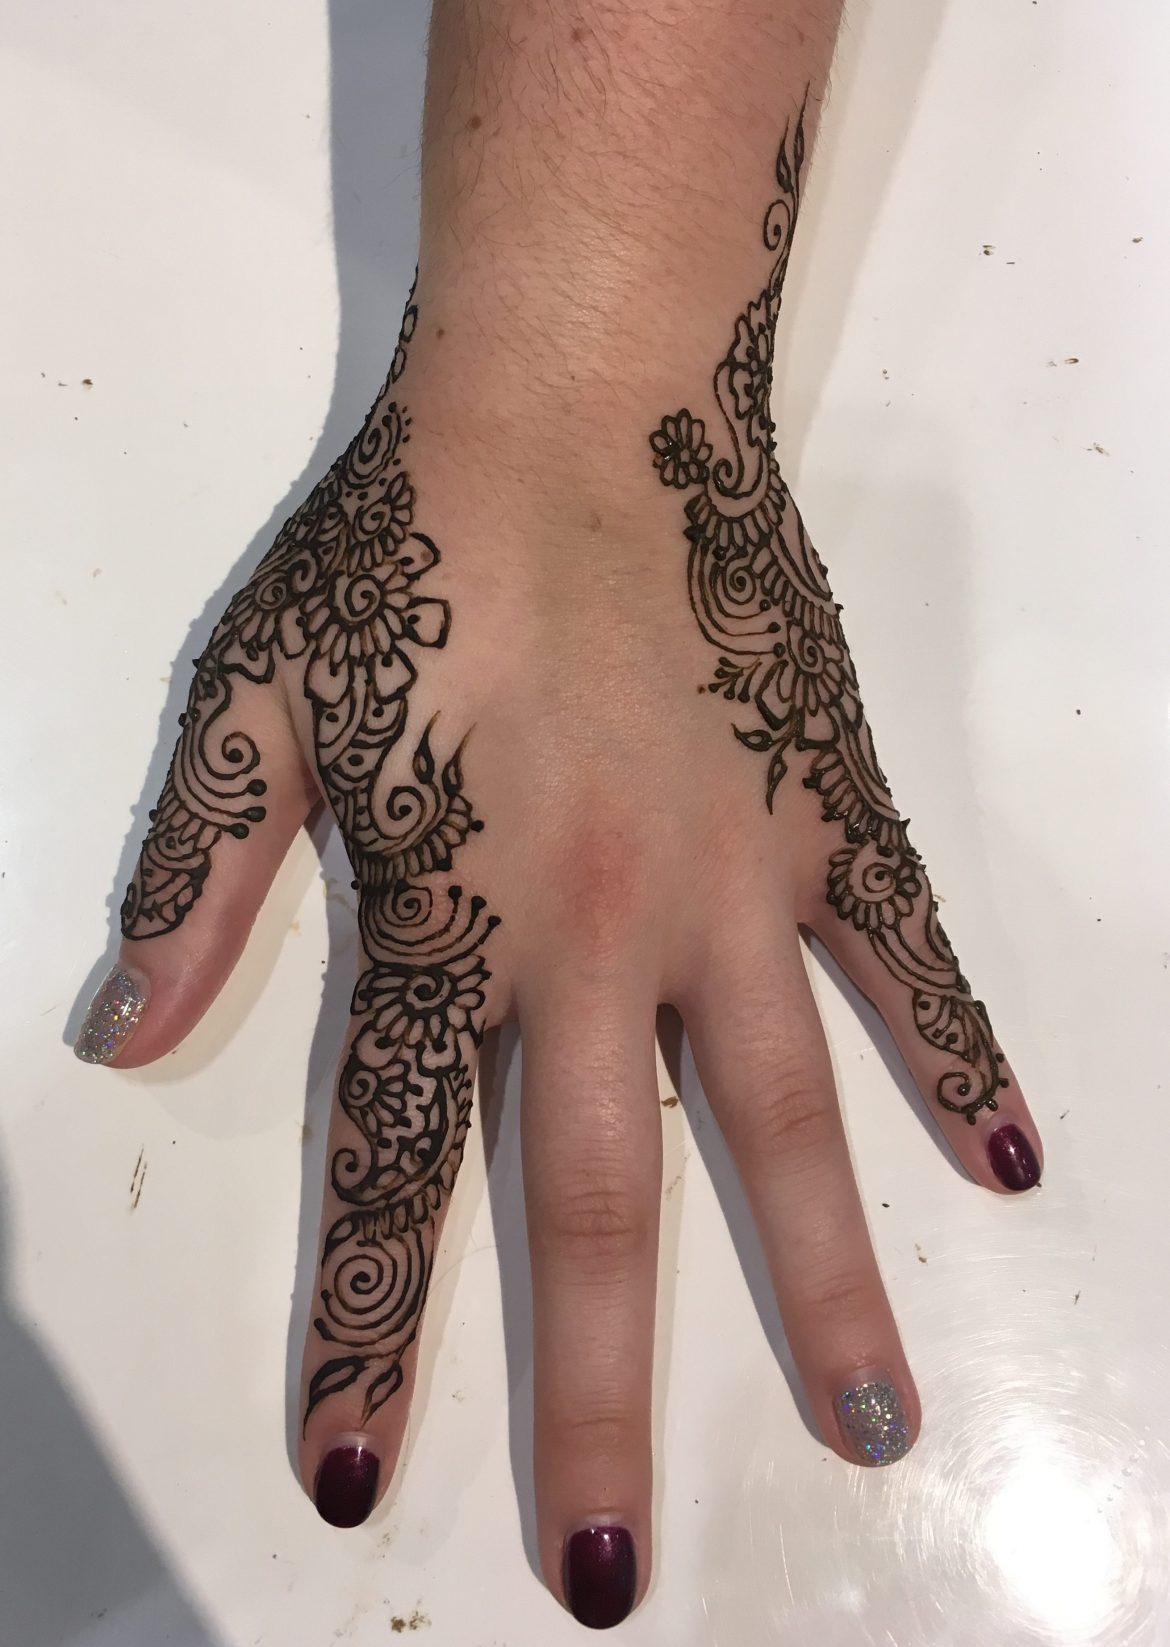 Beautiful henna on manicured hand.